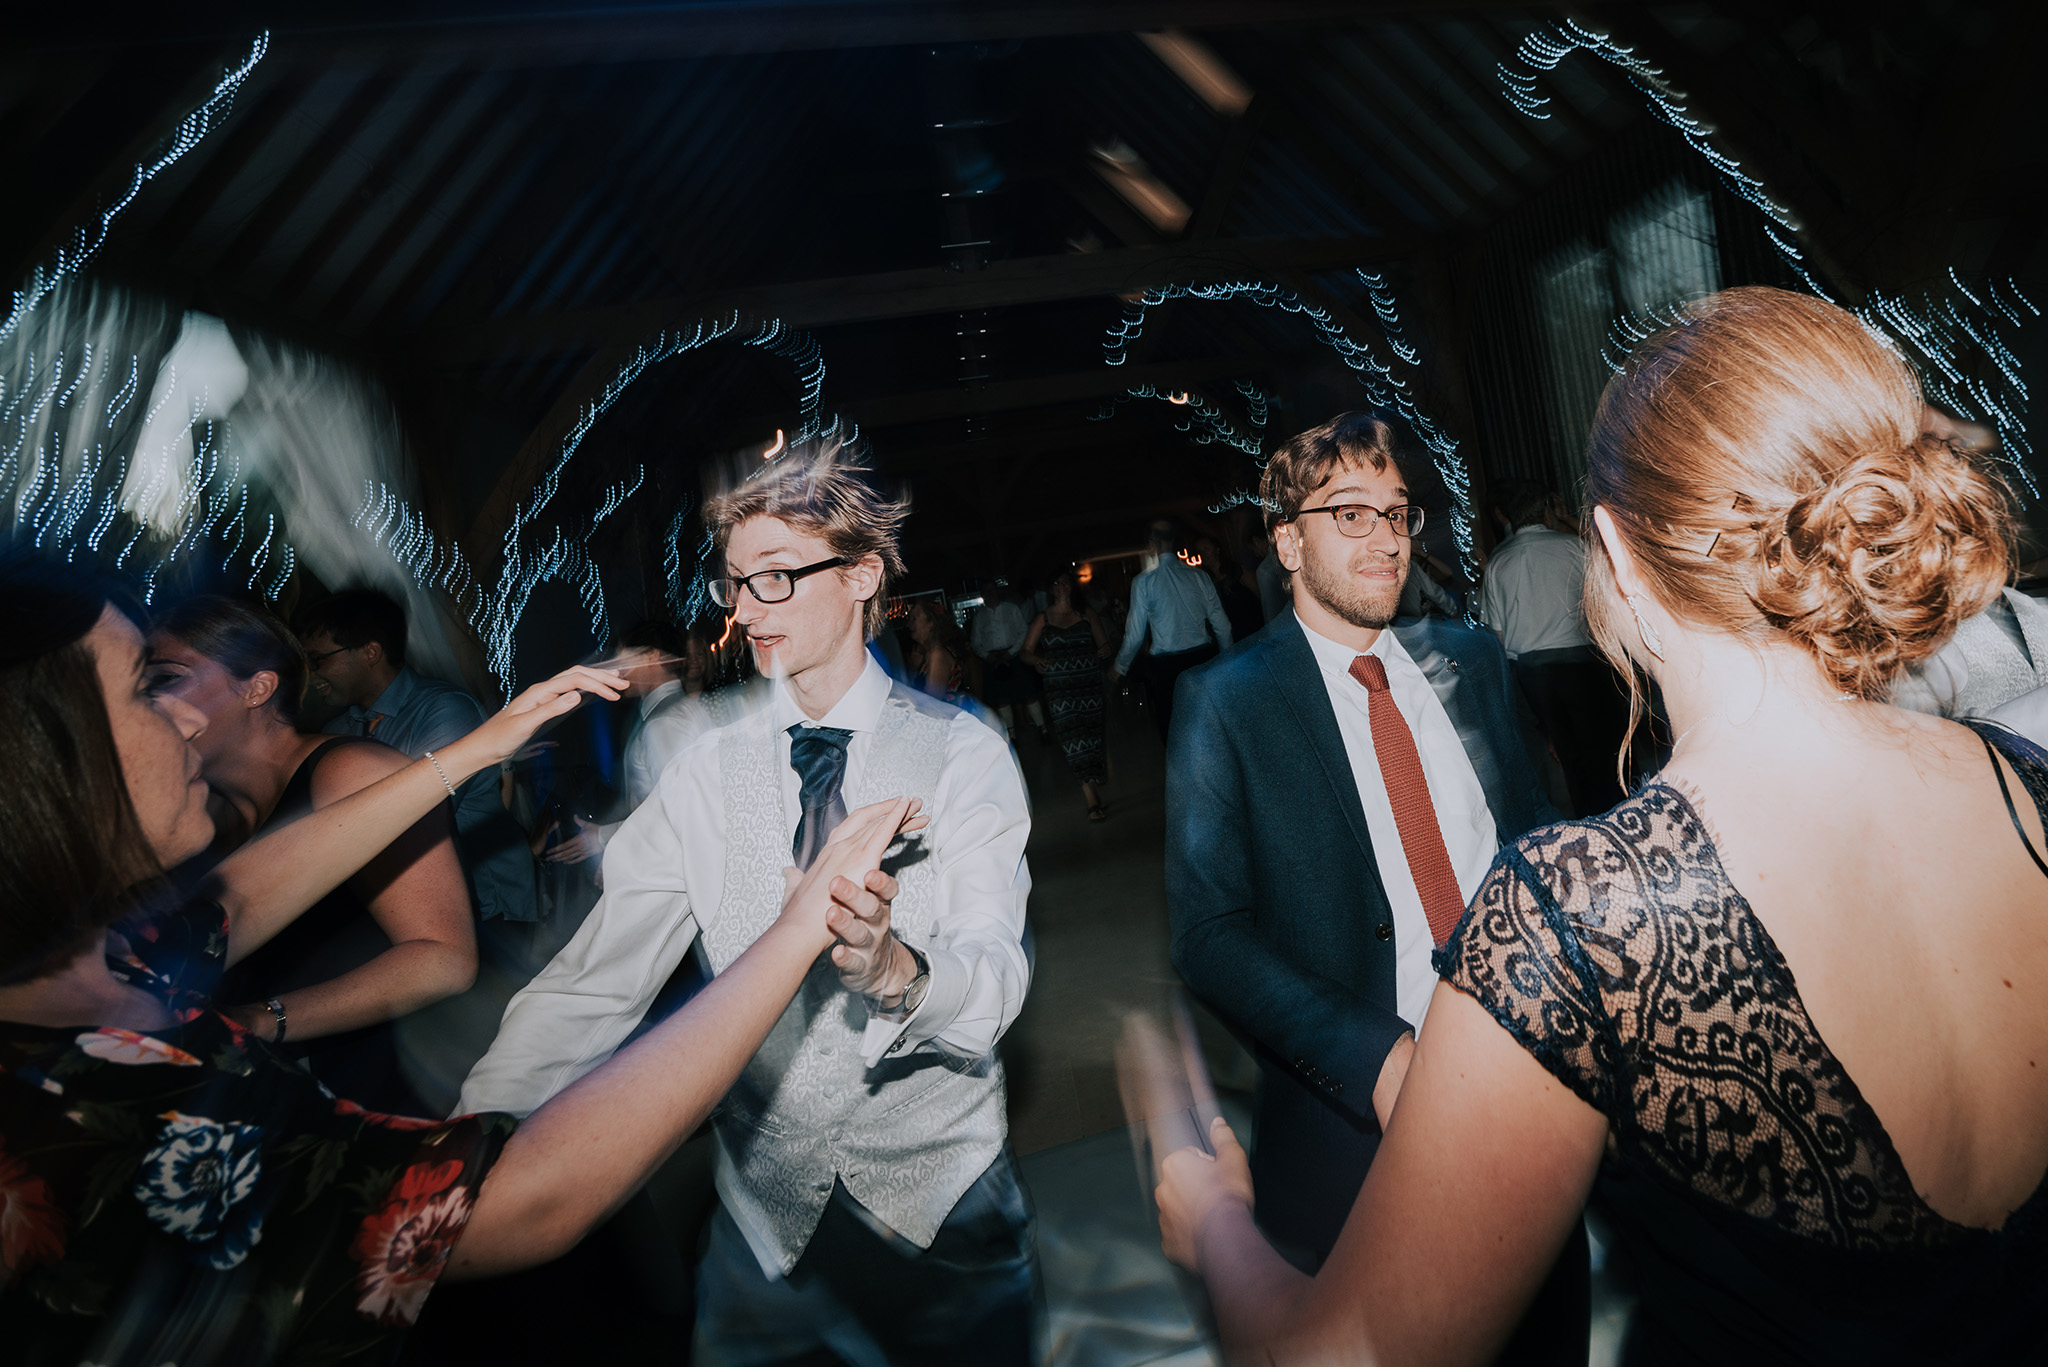 scott-stockwell-photography-wedding-24.jpg